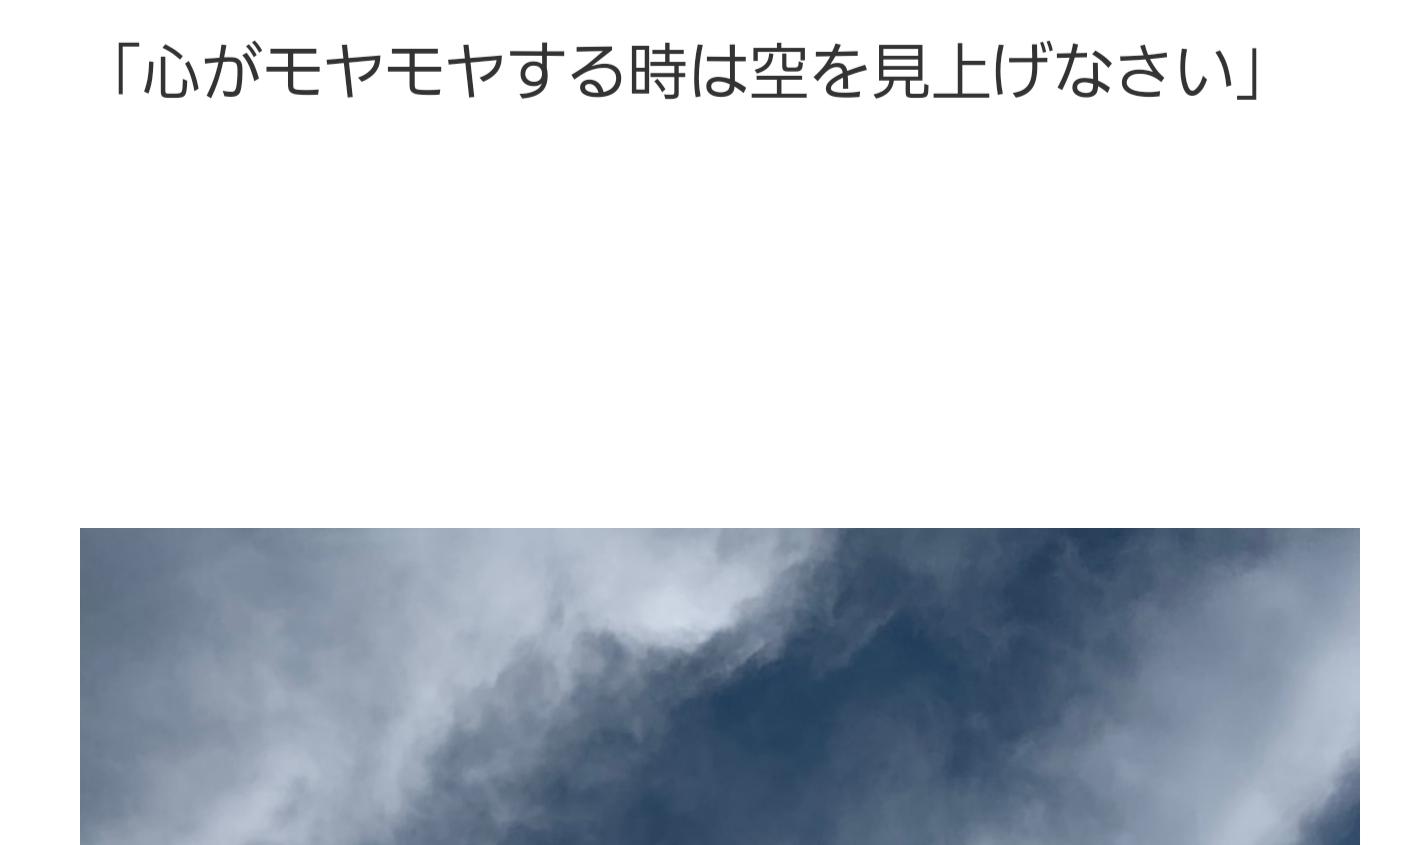 20191026230812fdc.jpg